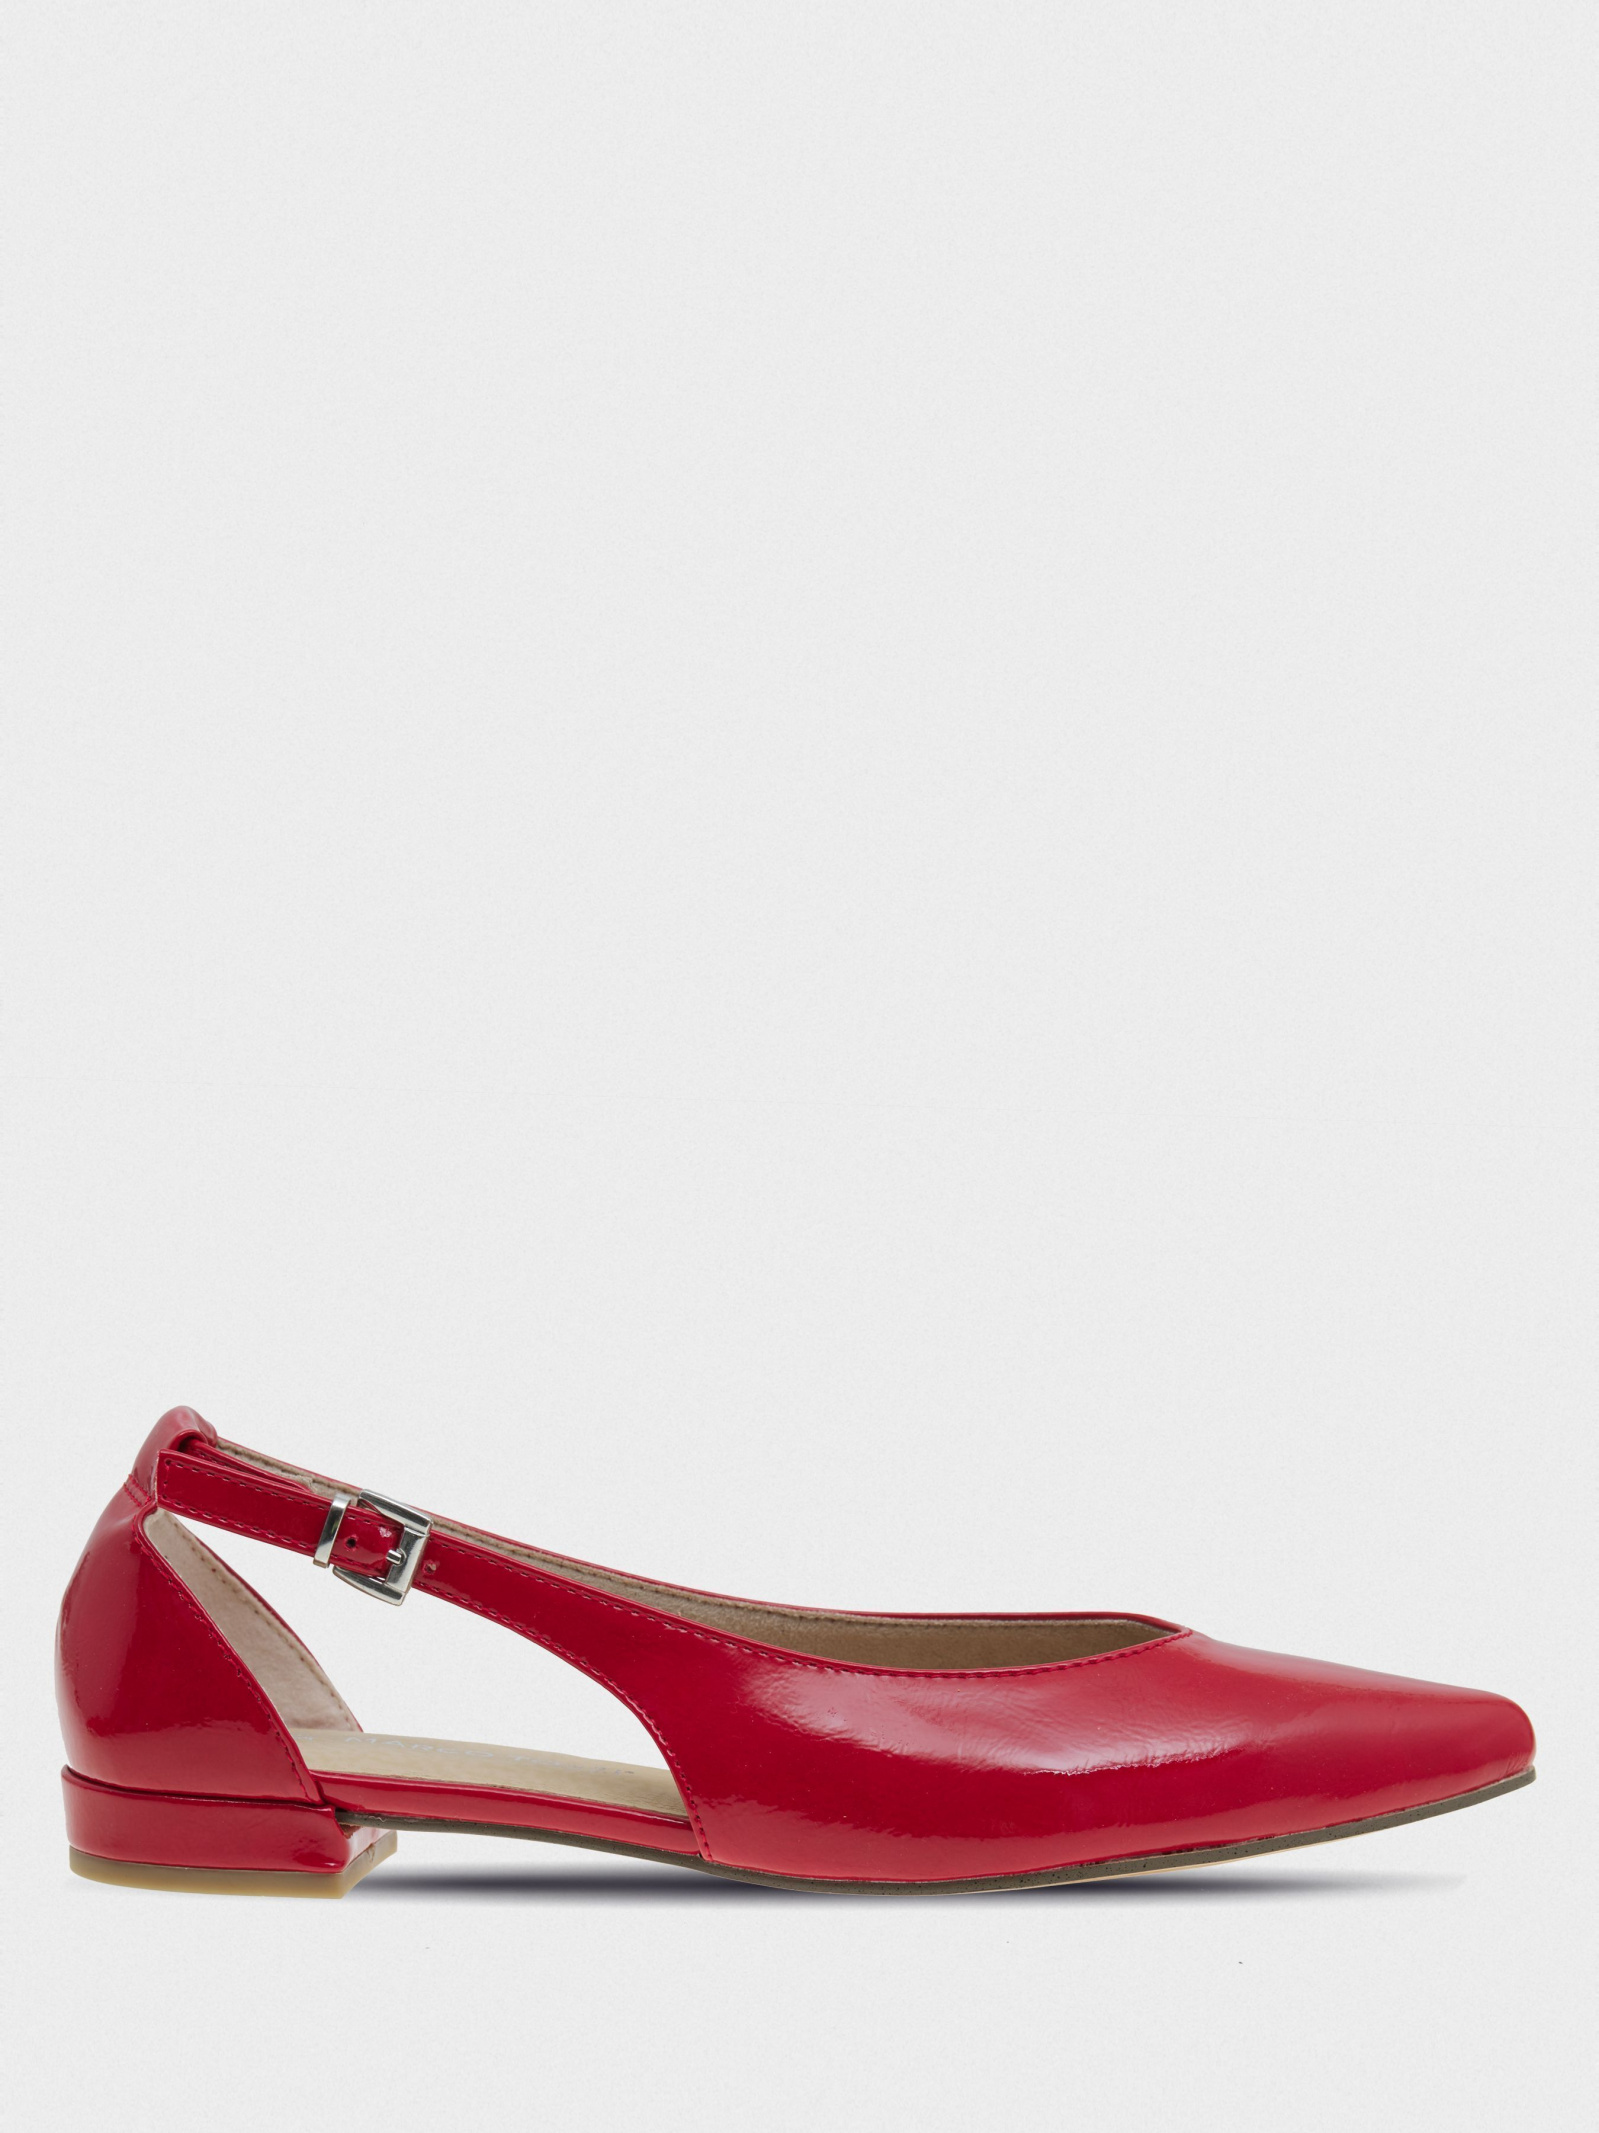 Балетки женские Marco Tozzi 3H382 размерная сетка обуви, 2017